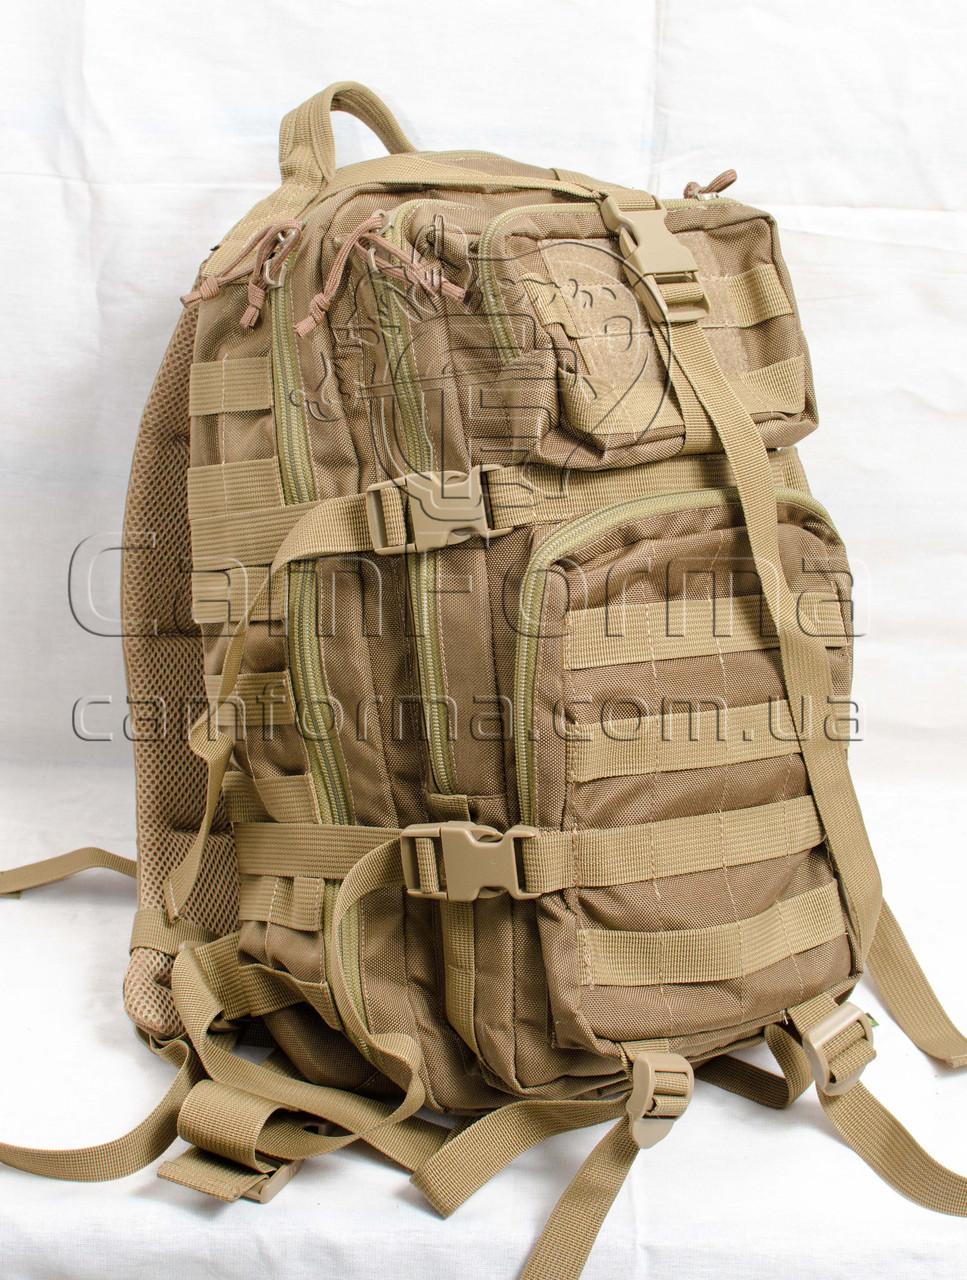 Рюкзак Tactic S (25L)  койот Cordura